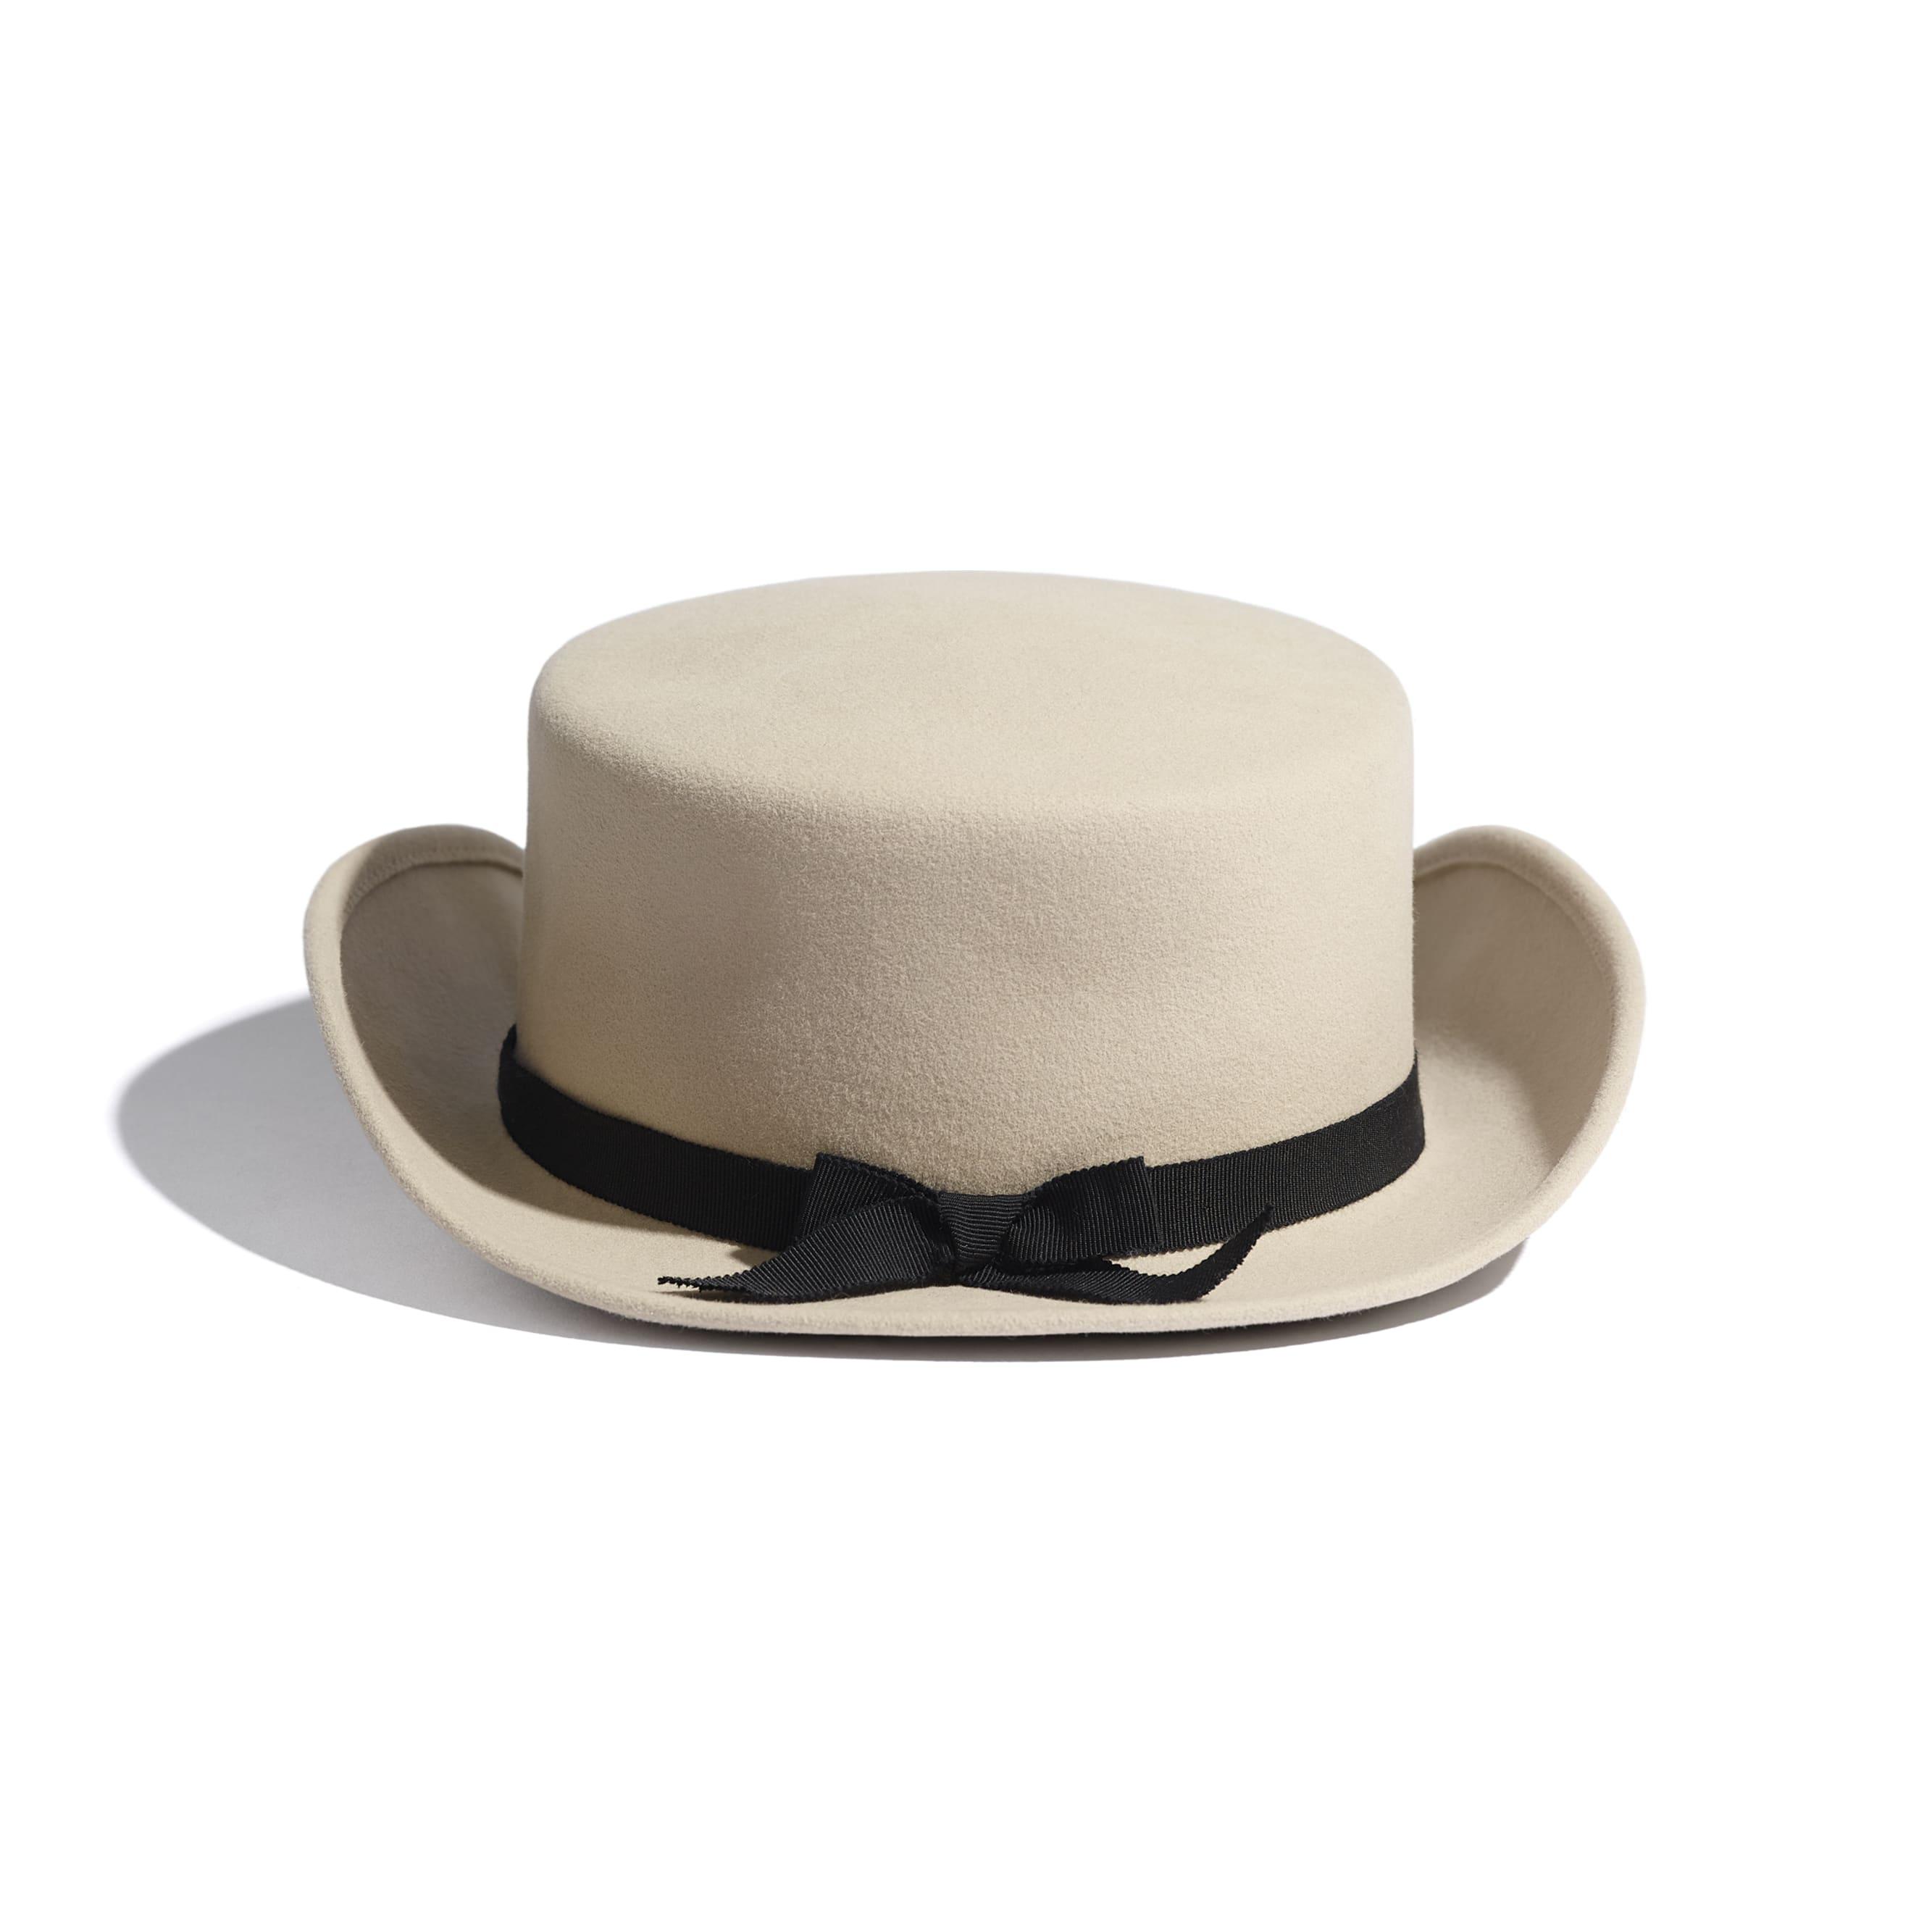 Hat - Beige & Black - Felt & Grosgrain - Alternative view - see standard sized version